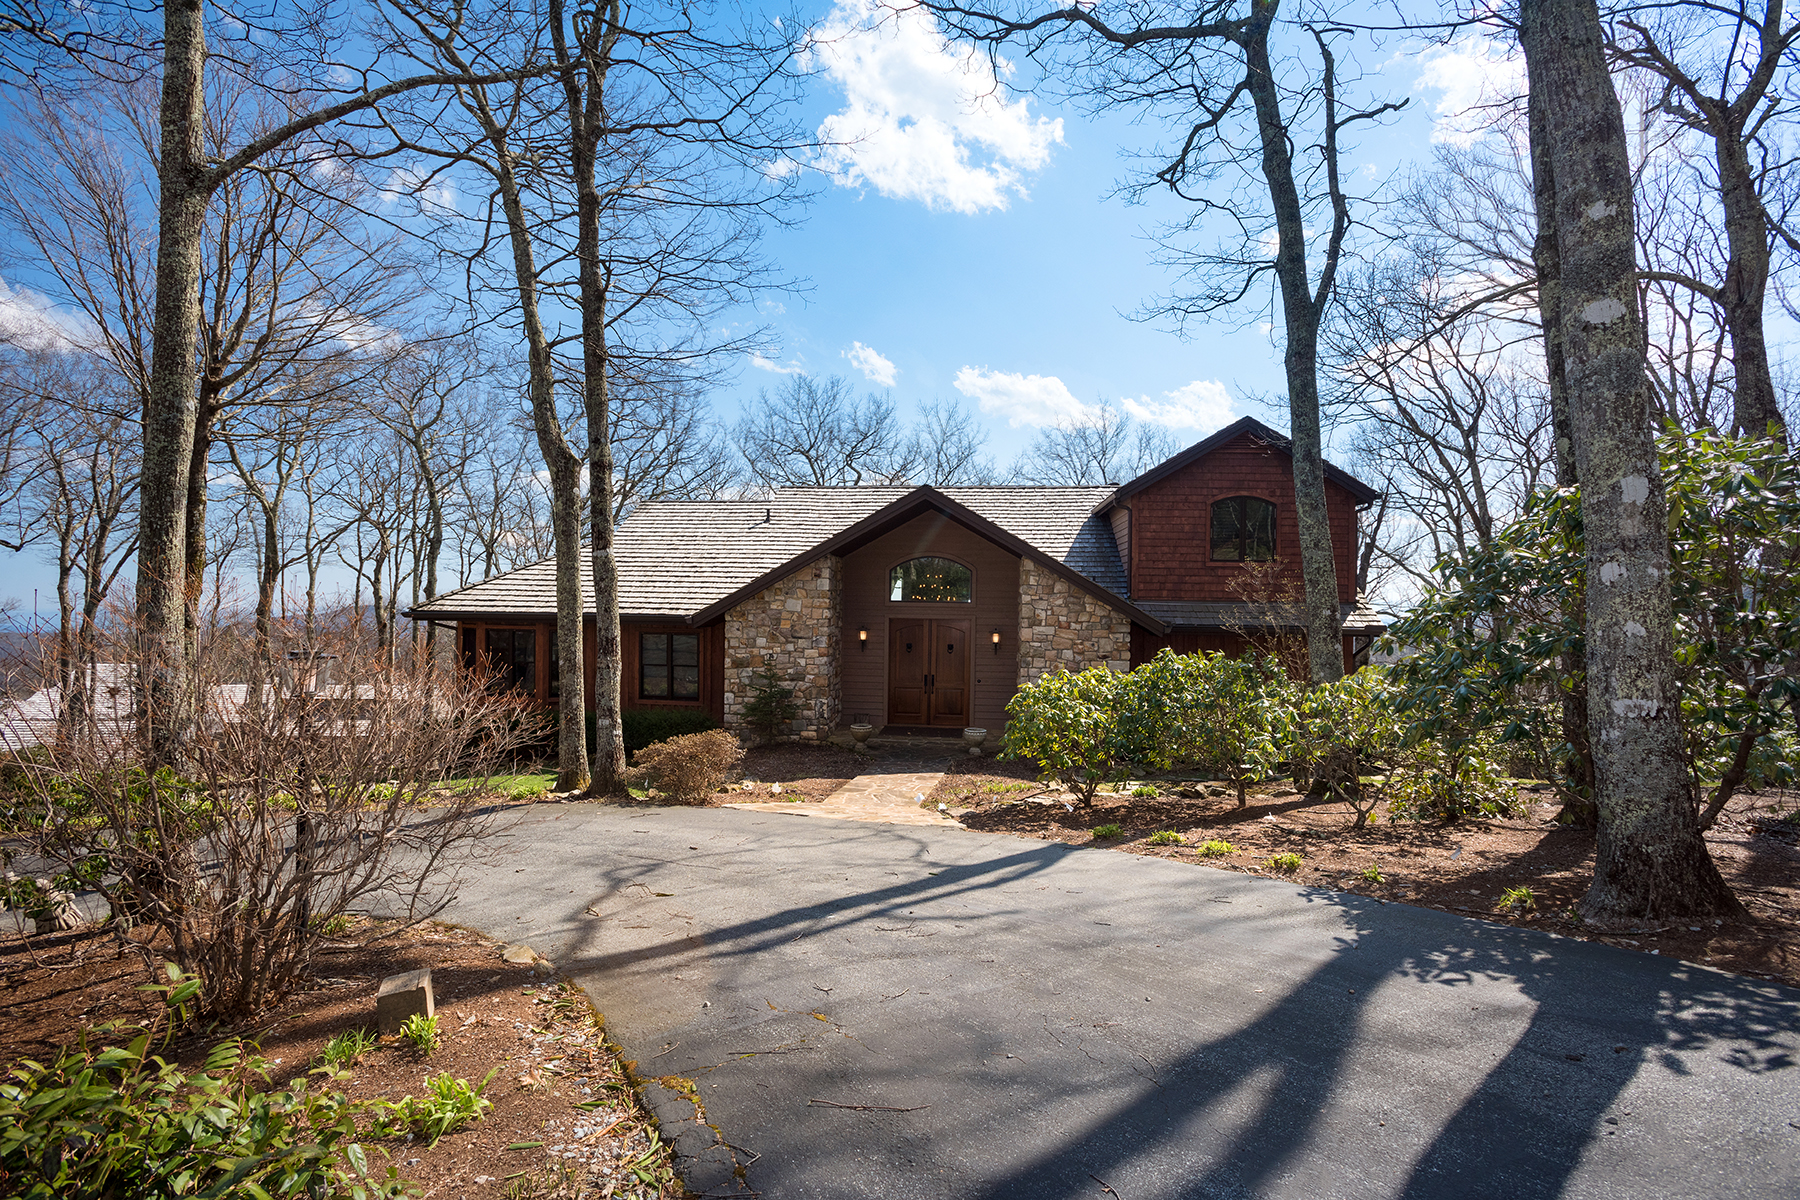 Single Family Home for Sale at LINVILLE - LINVILLE RIDGE 818 Crest Trail 8 Linville, North Carolina, 28646 United States